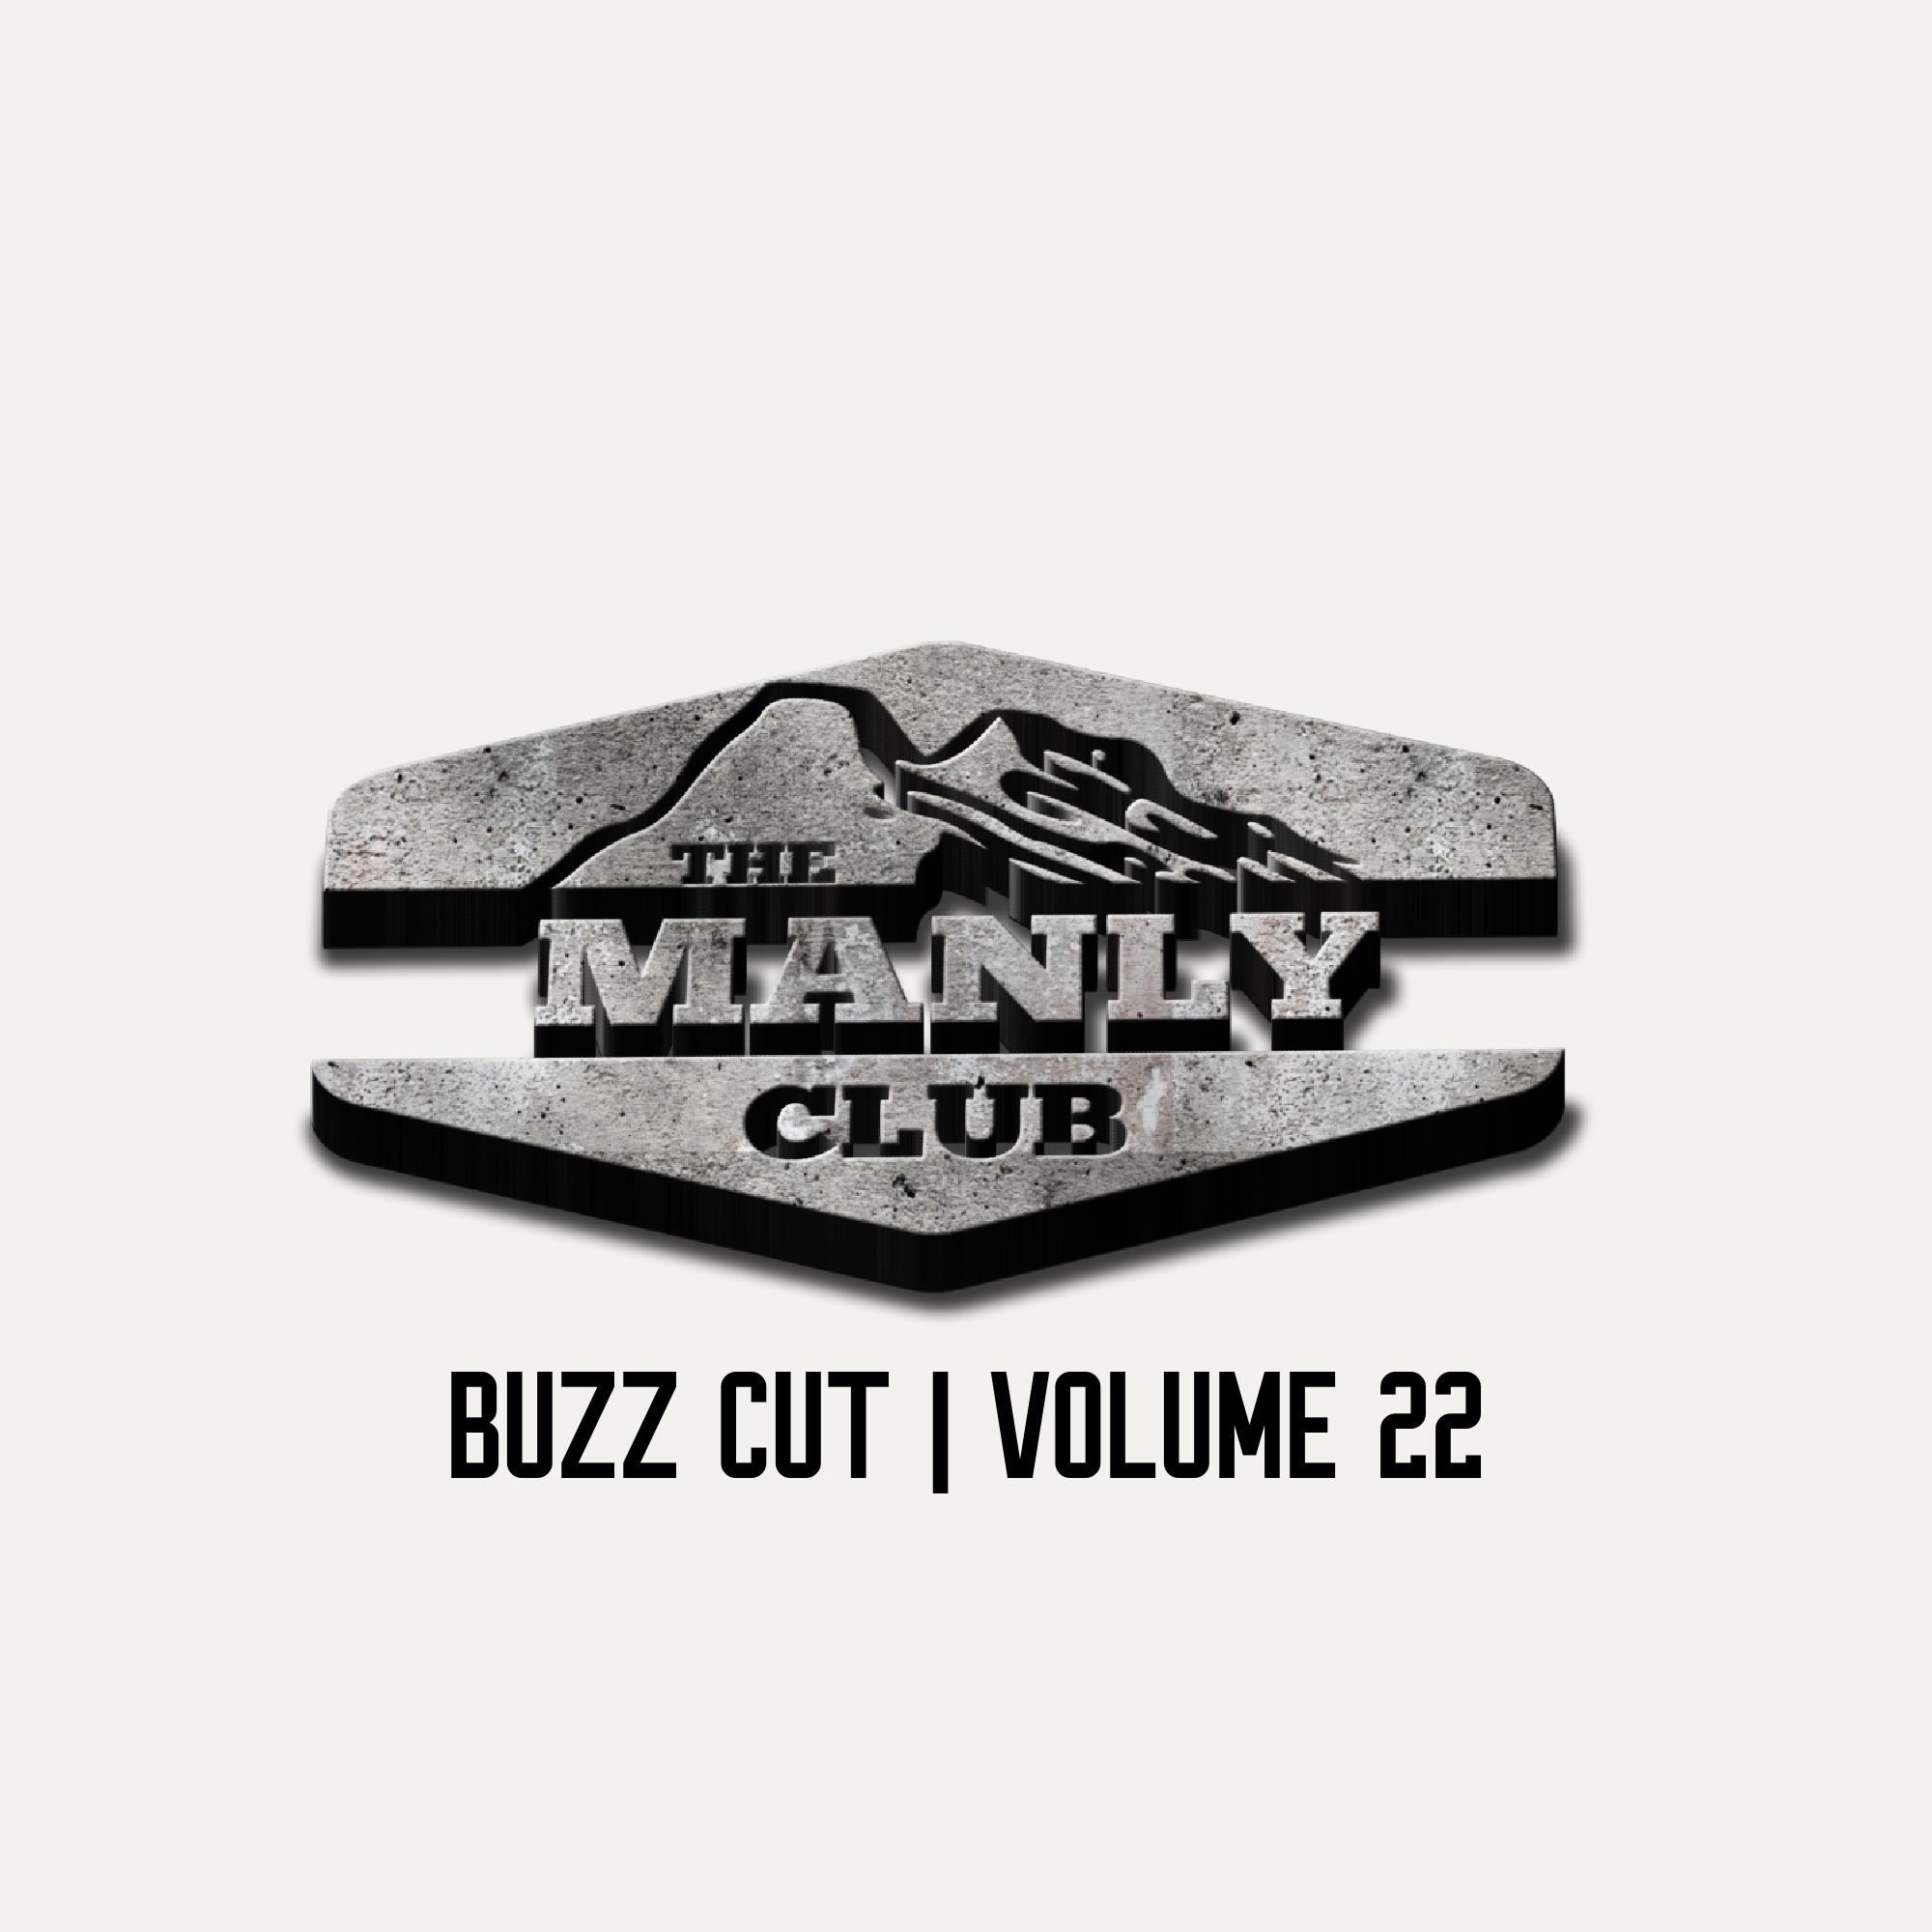 the manly club buzz cut volume 22